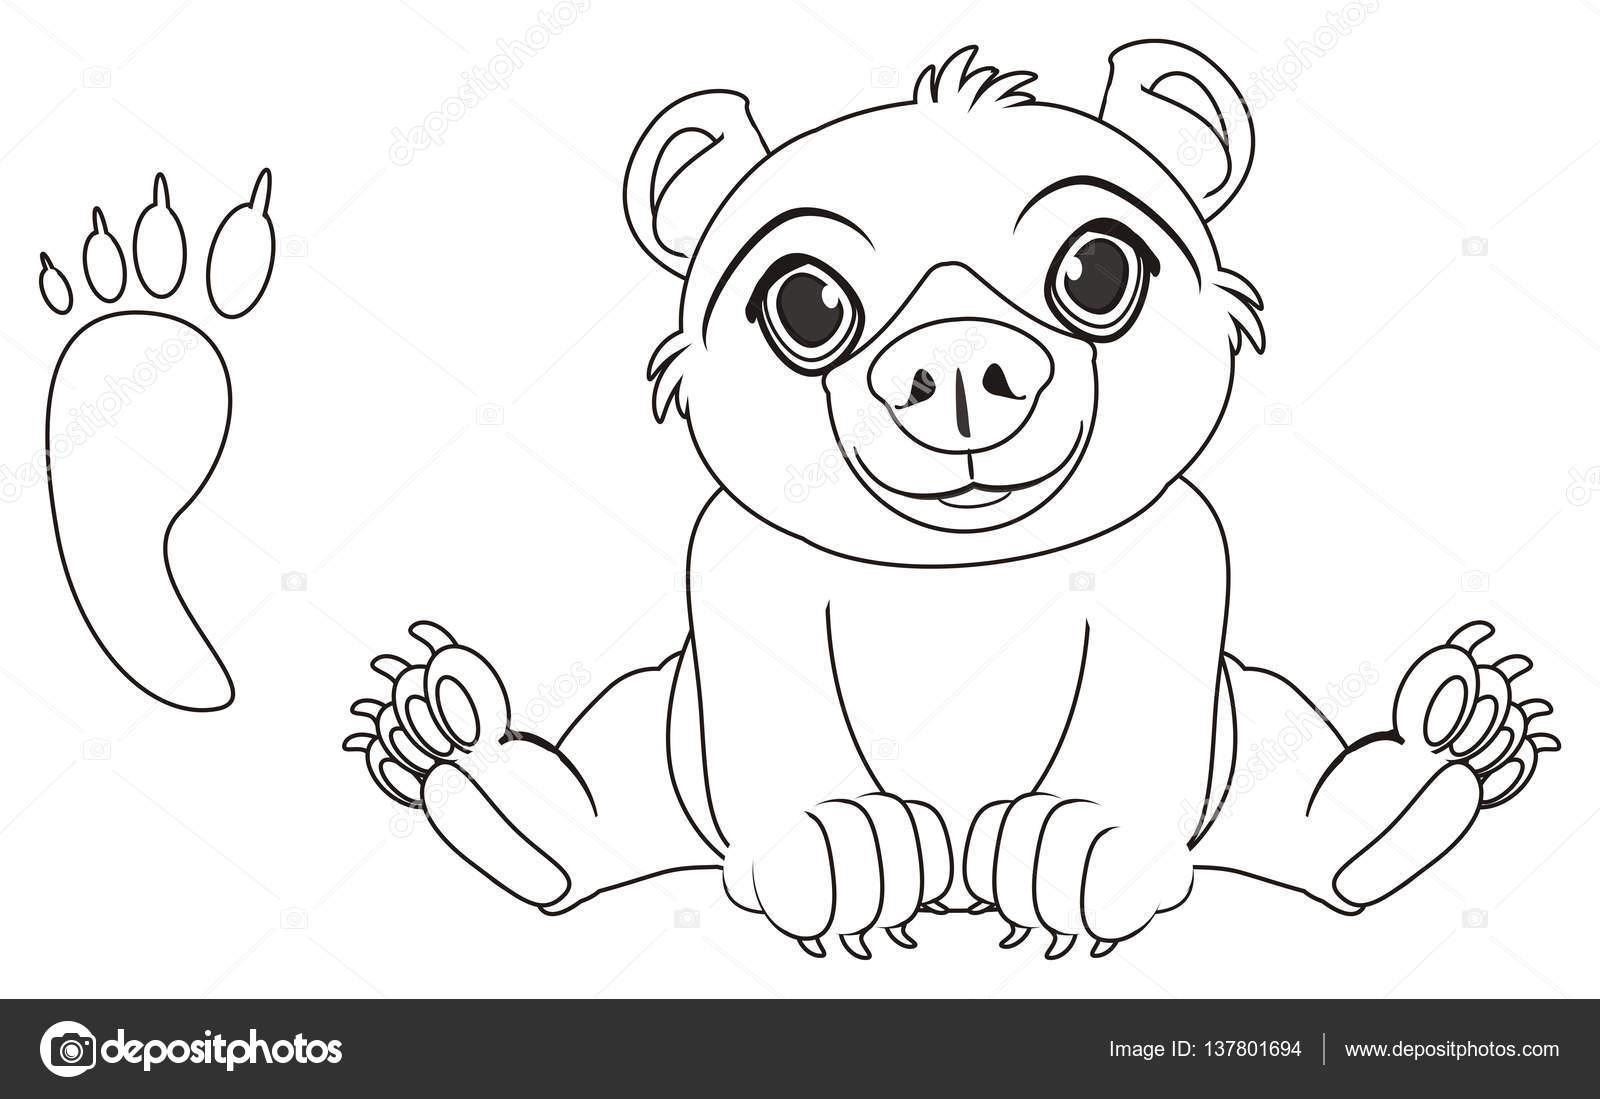 lindo oso para colorear — Fotos de Stock © tatty77tatty #137801694